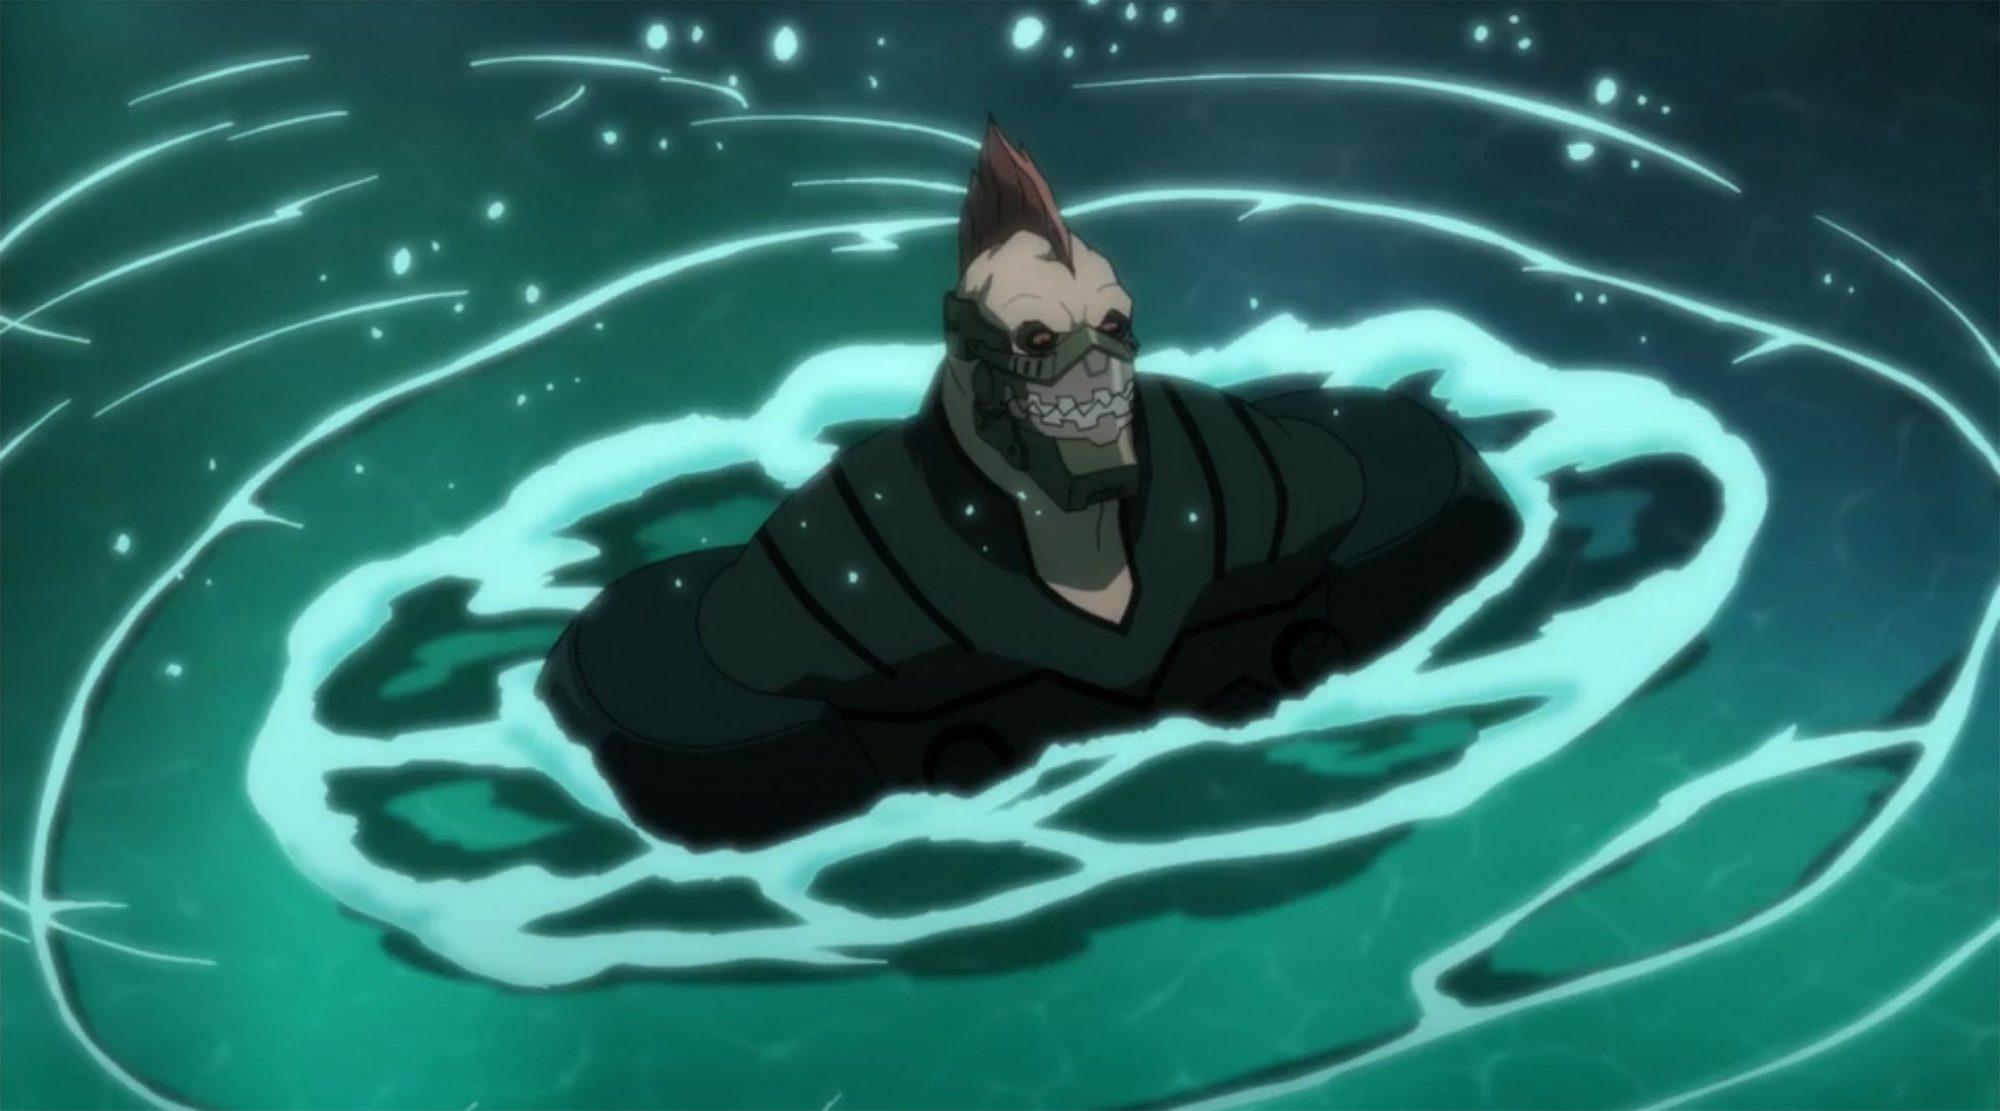 King Shark in Batman Assault on Arkham